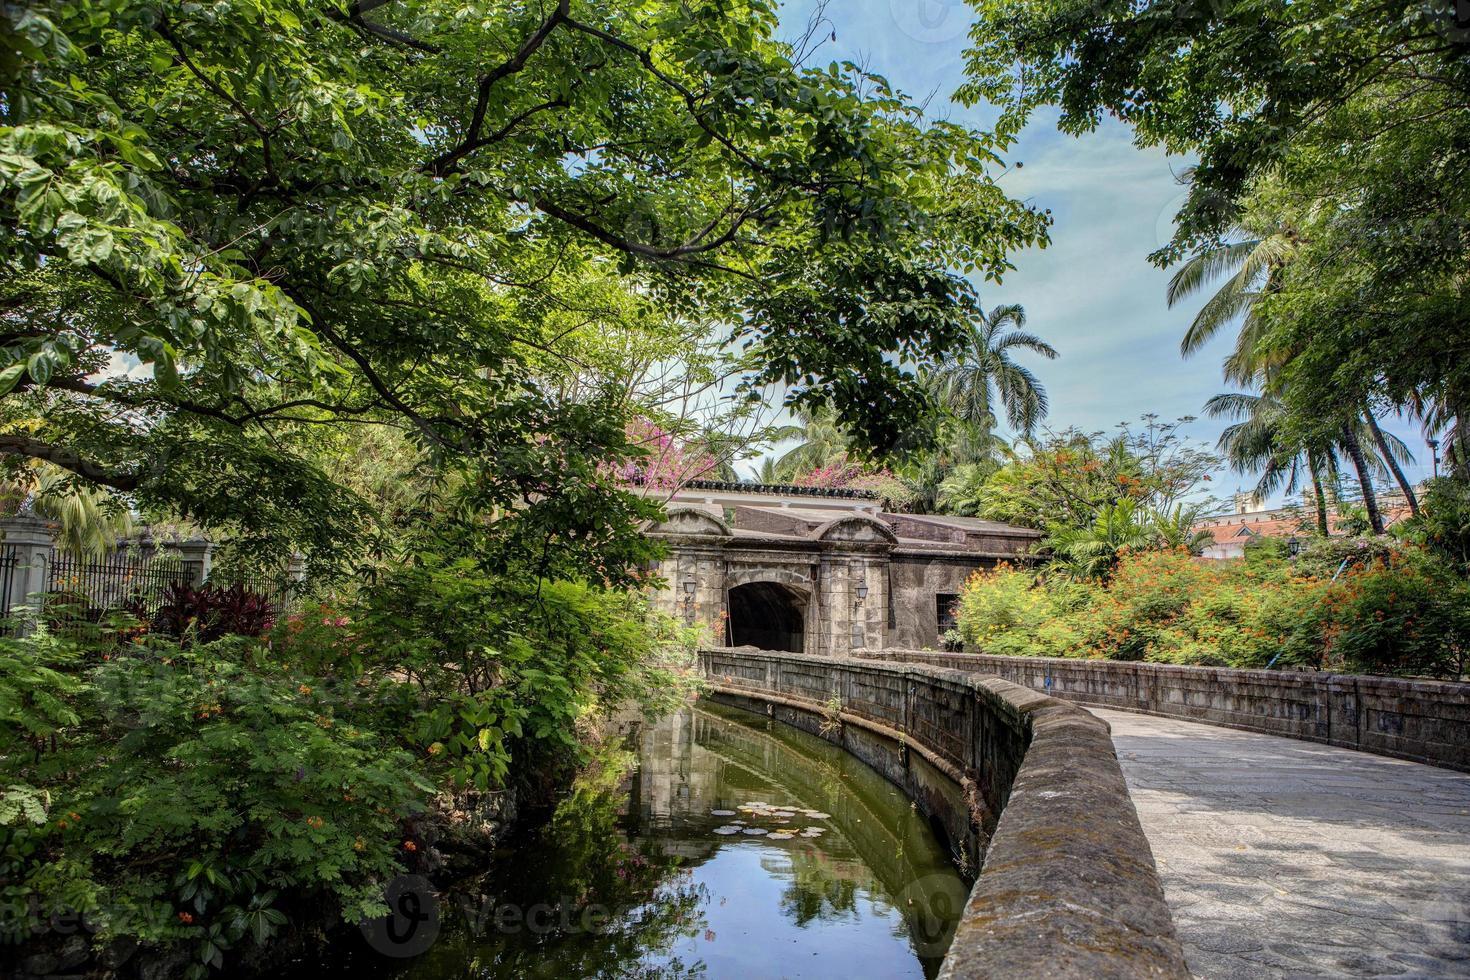 intramuros gamla stad i Manila foto